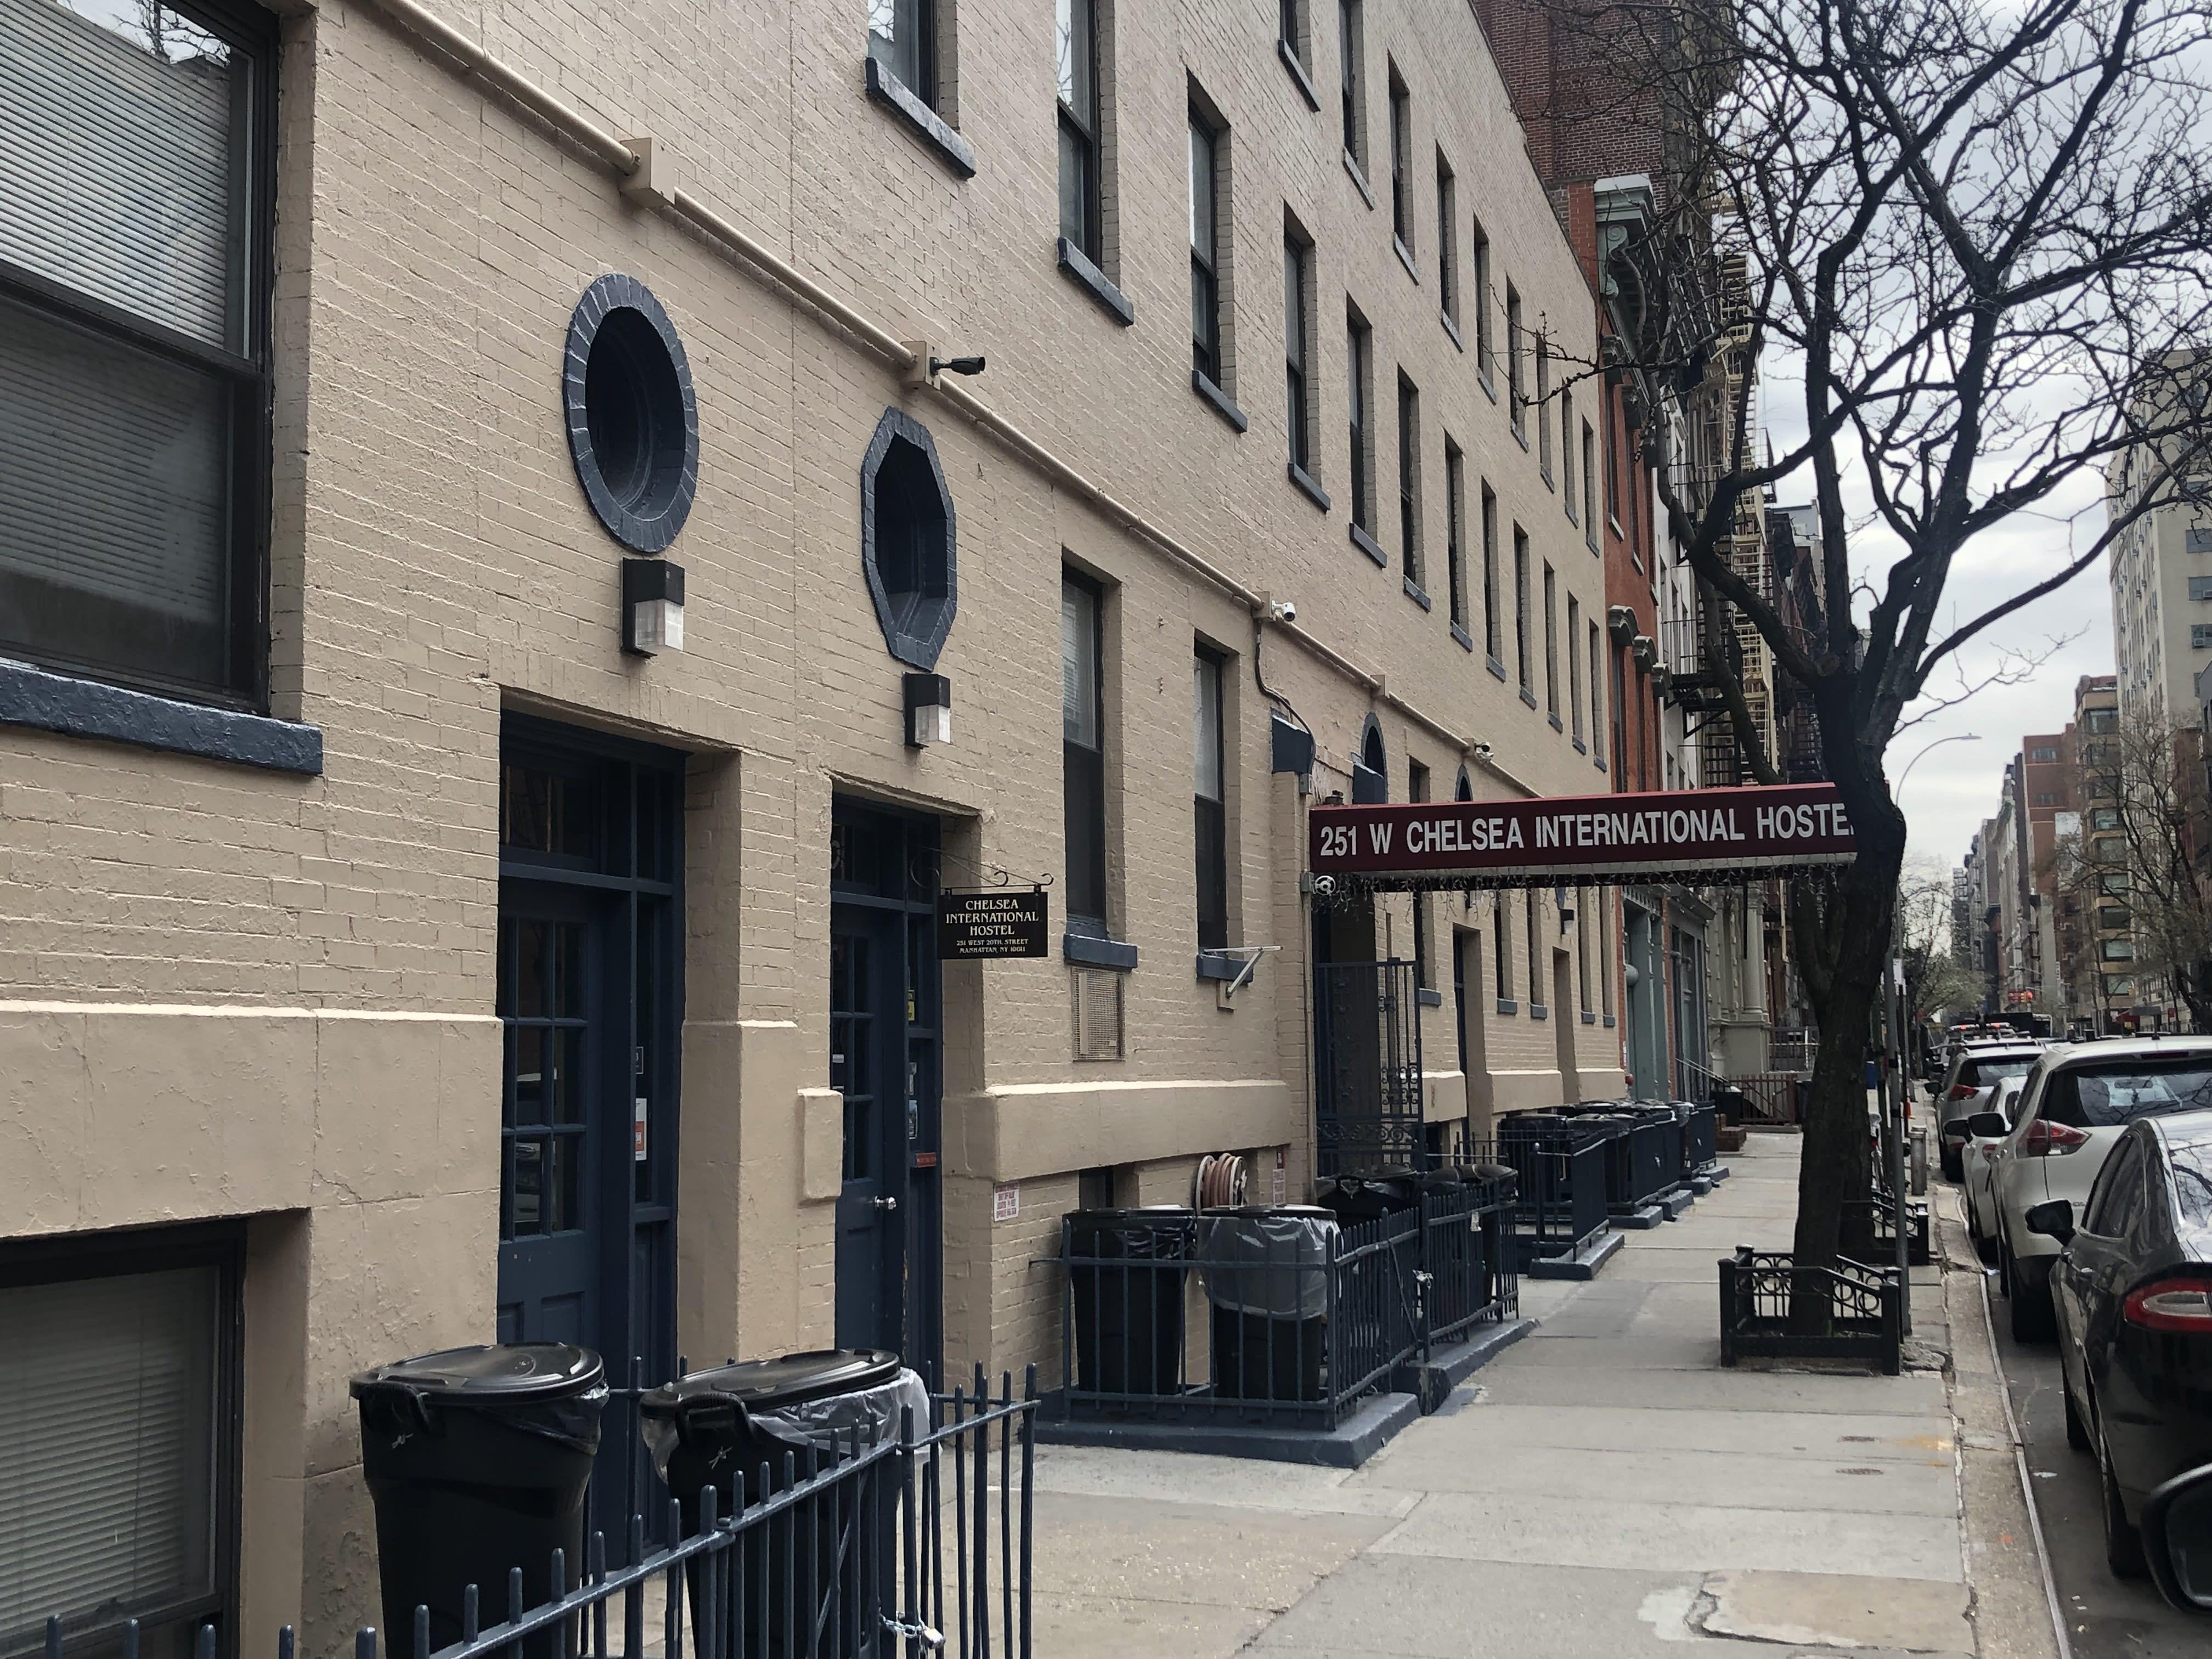 Chelsea International Hostel New York 2020 Prices Reviews Hostelworld